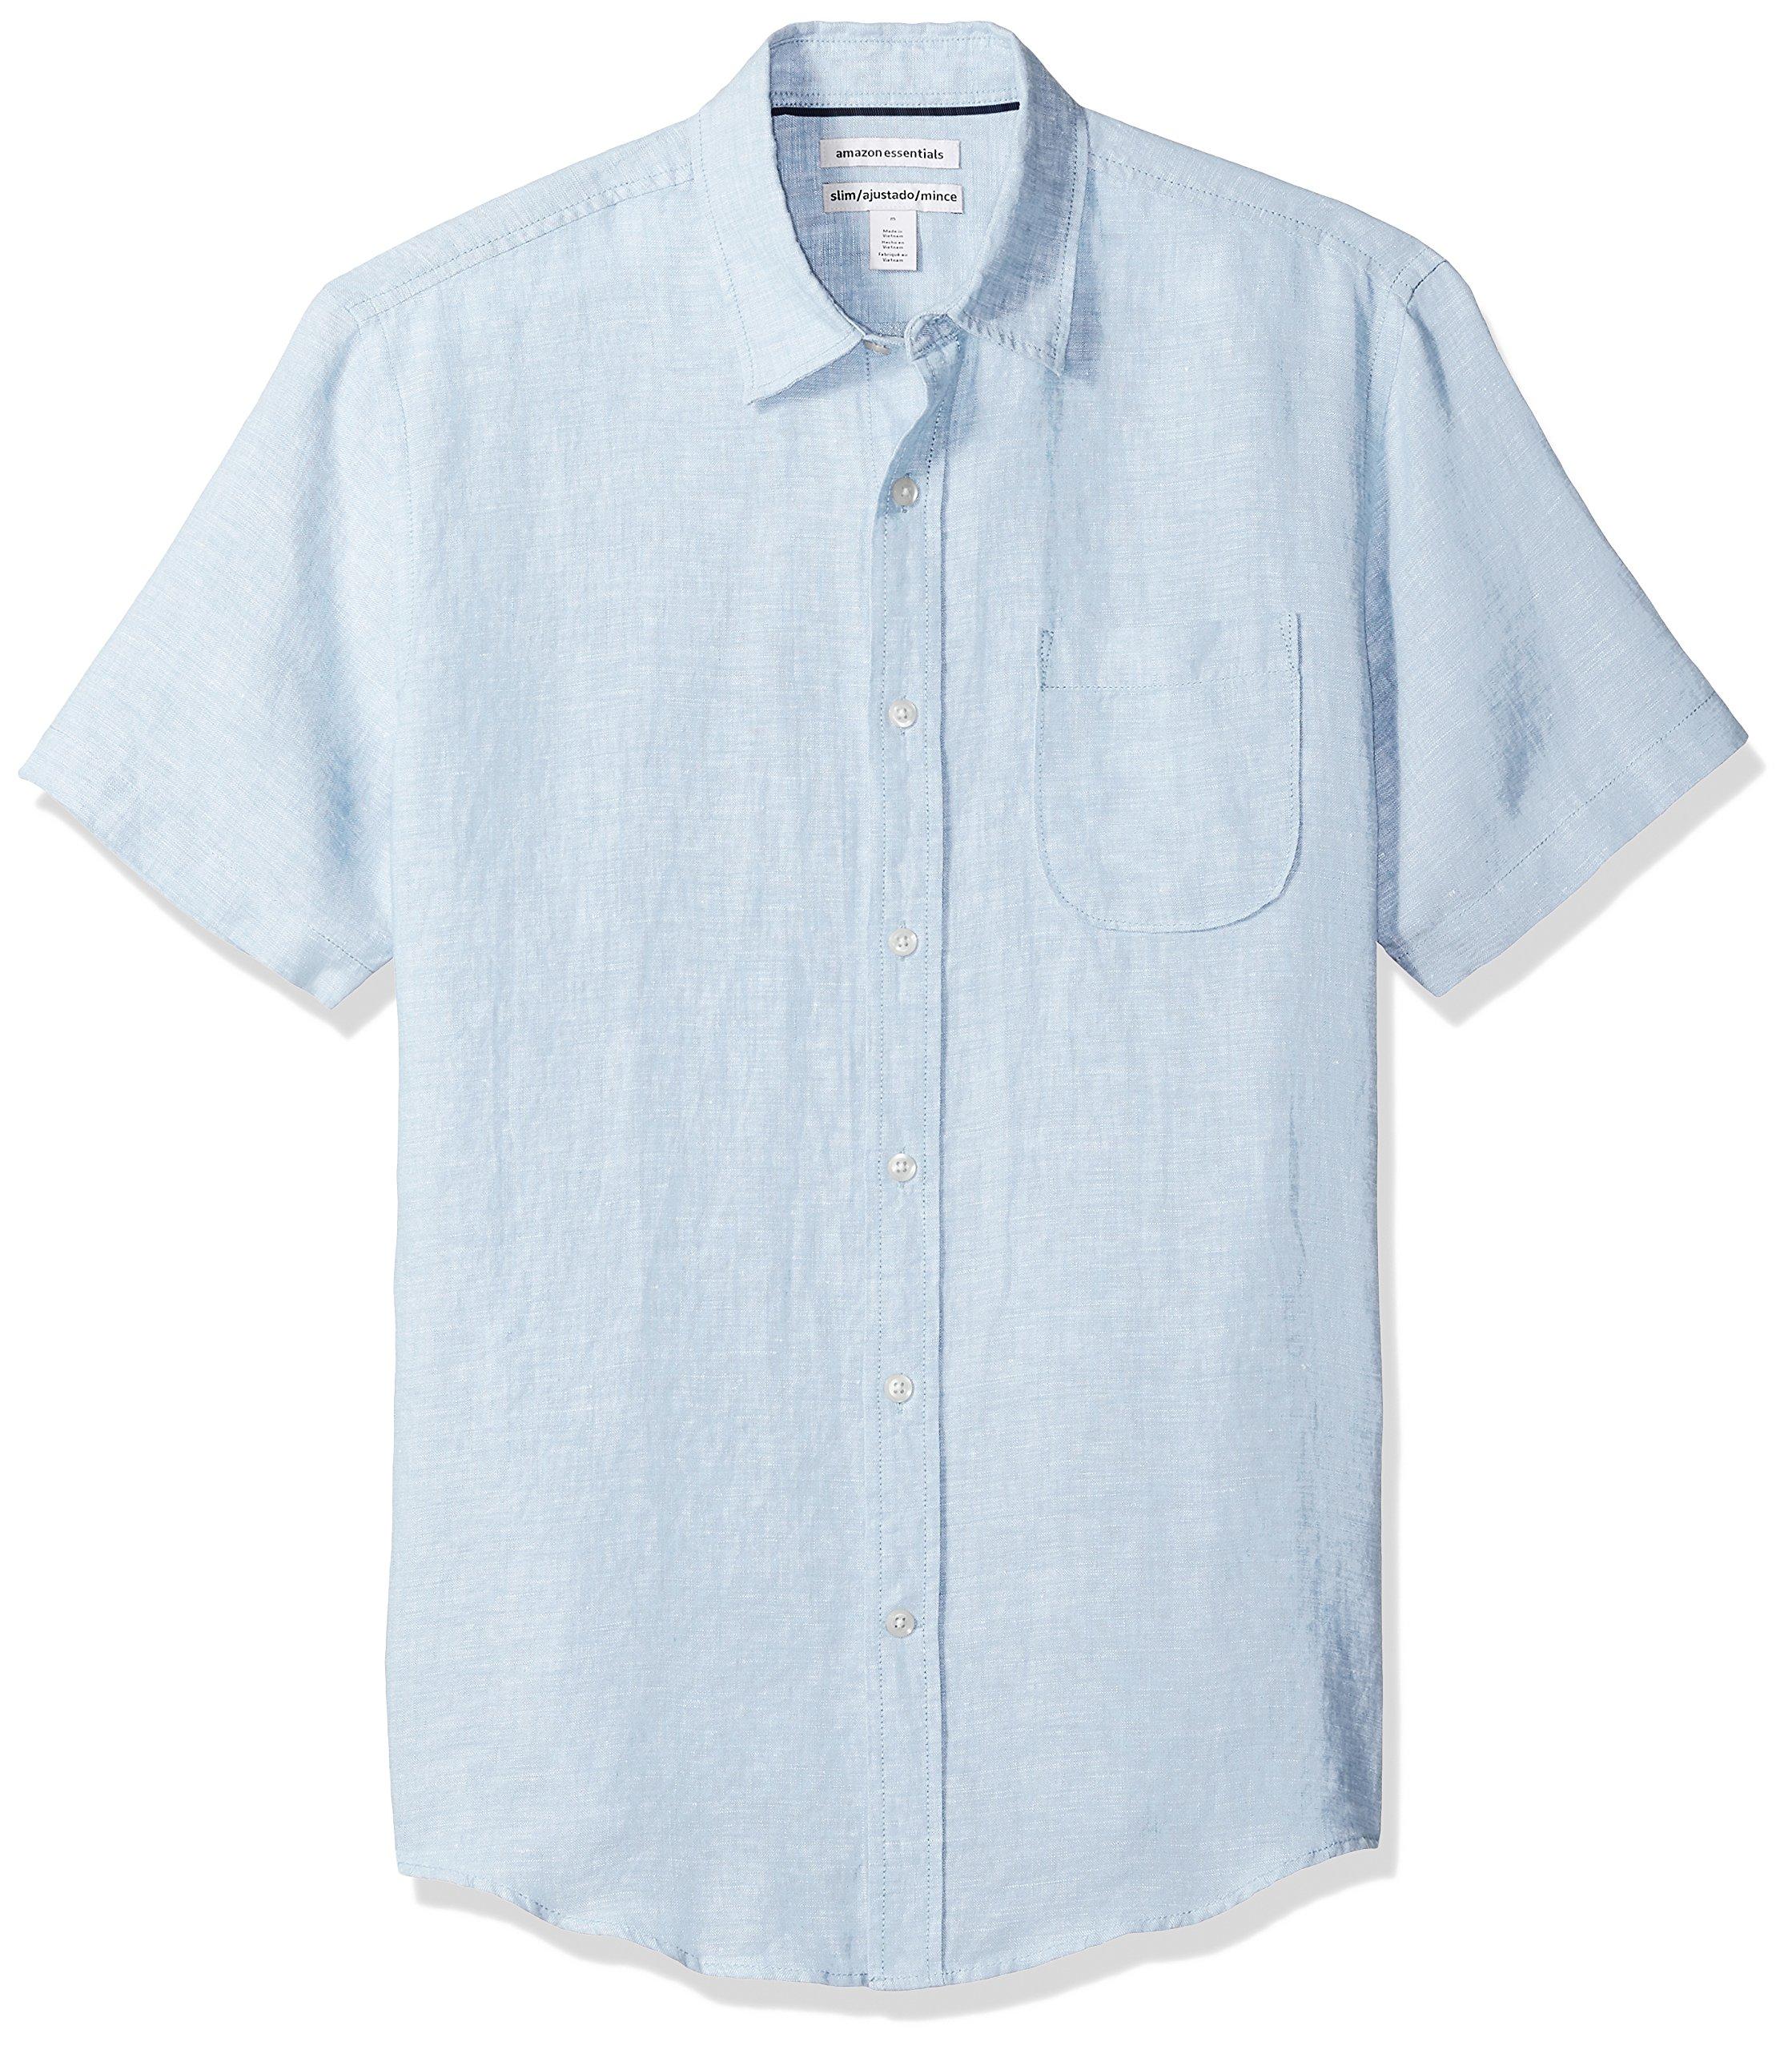 Amazon Essentials Men's Slim-Fit Short-Sleeve Linen Shirt, Light Blue, Large